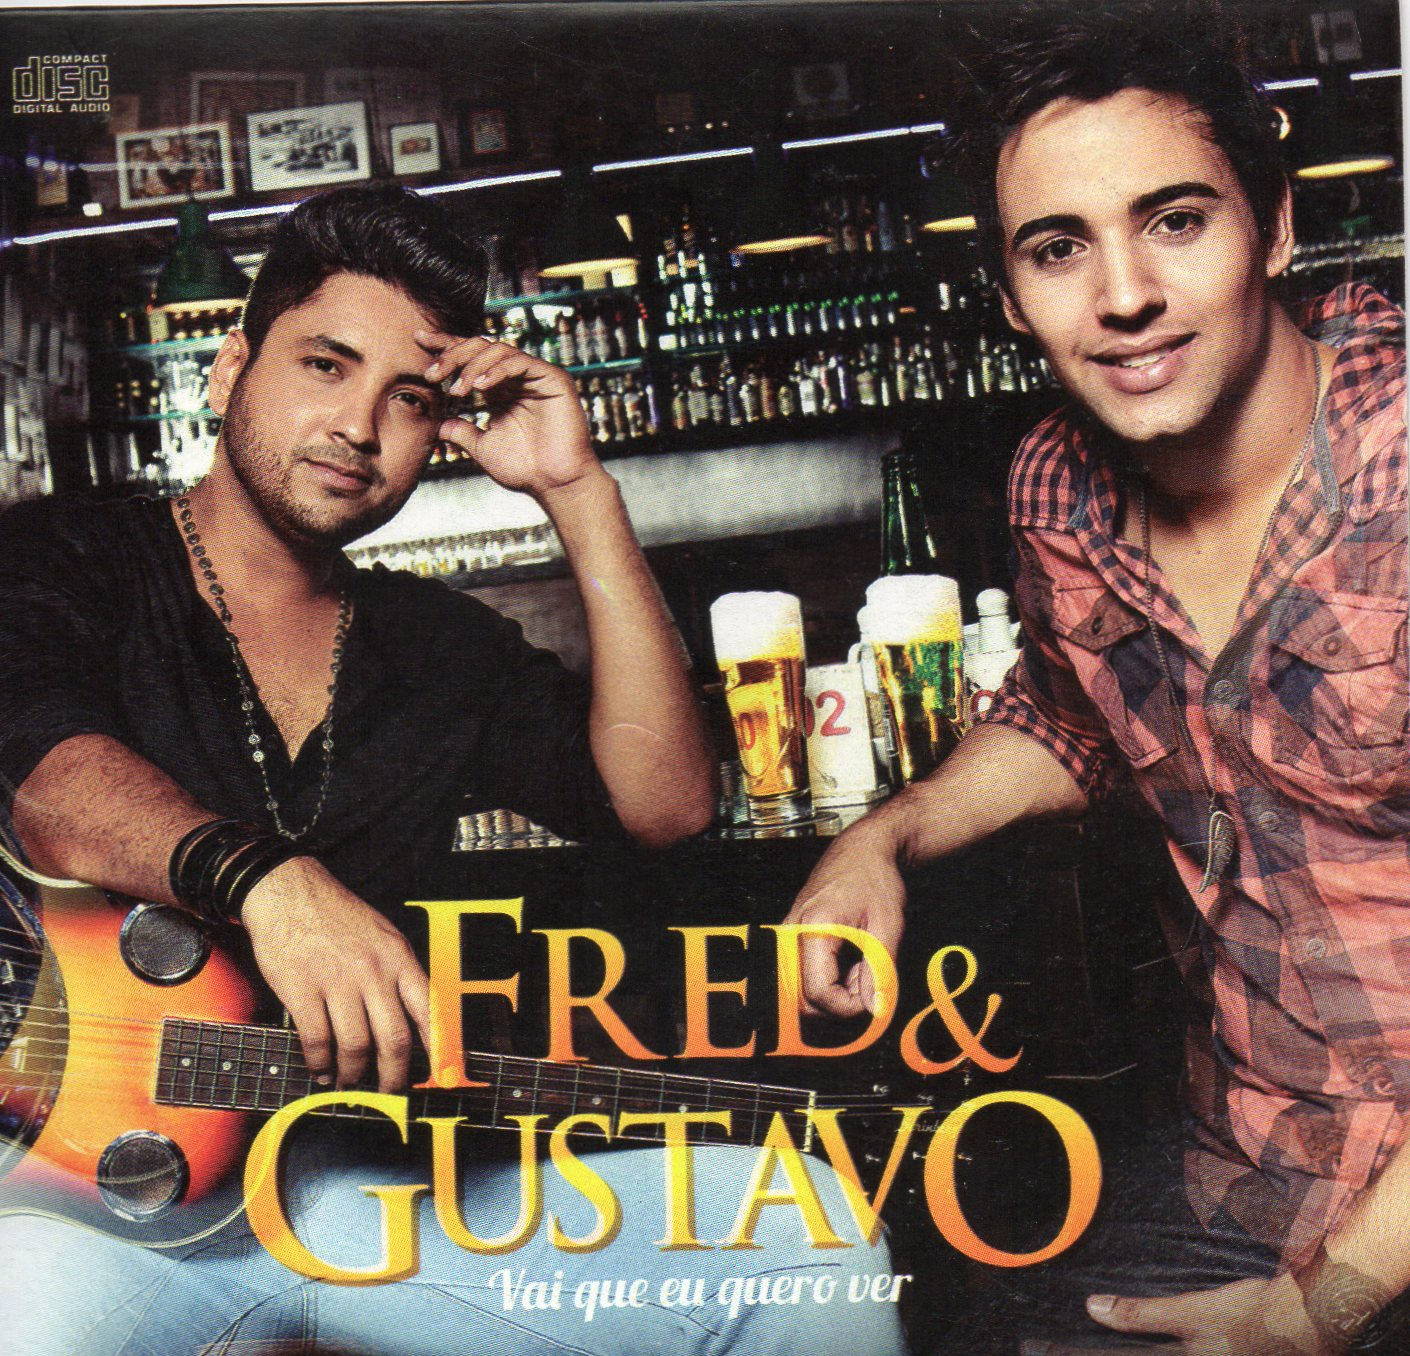 REVIEW – Fred & Gustavo – Vai que eu quero ver